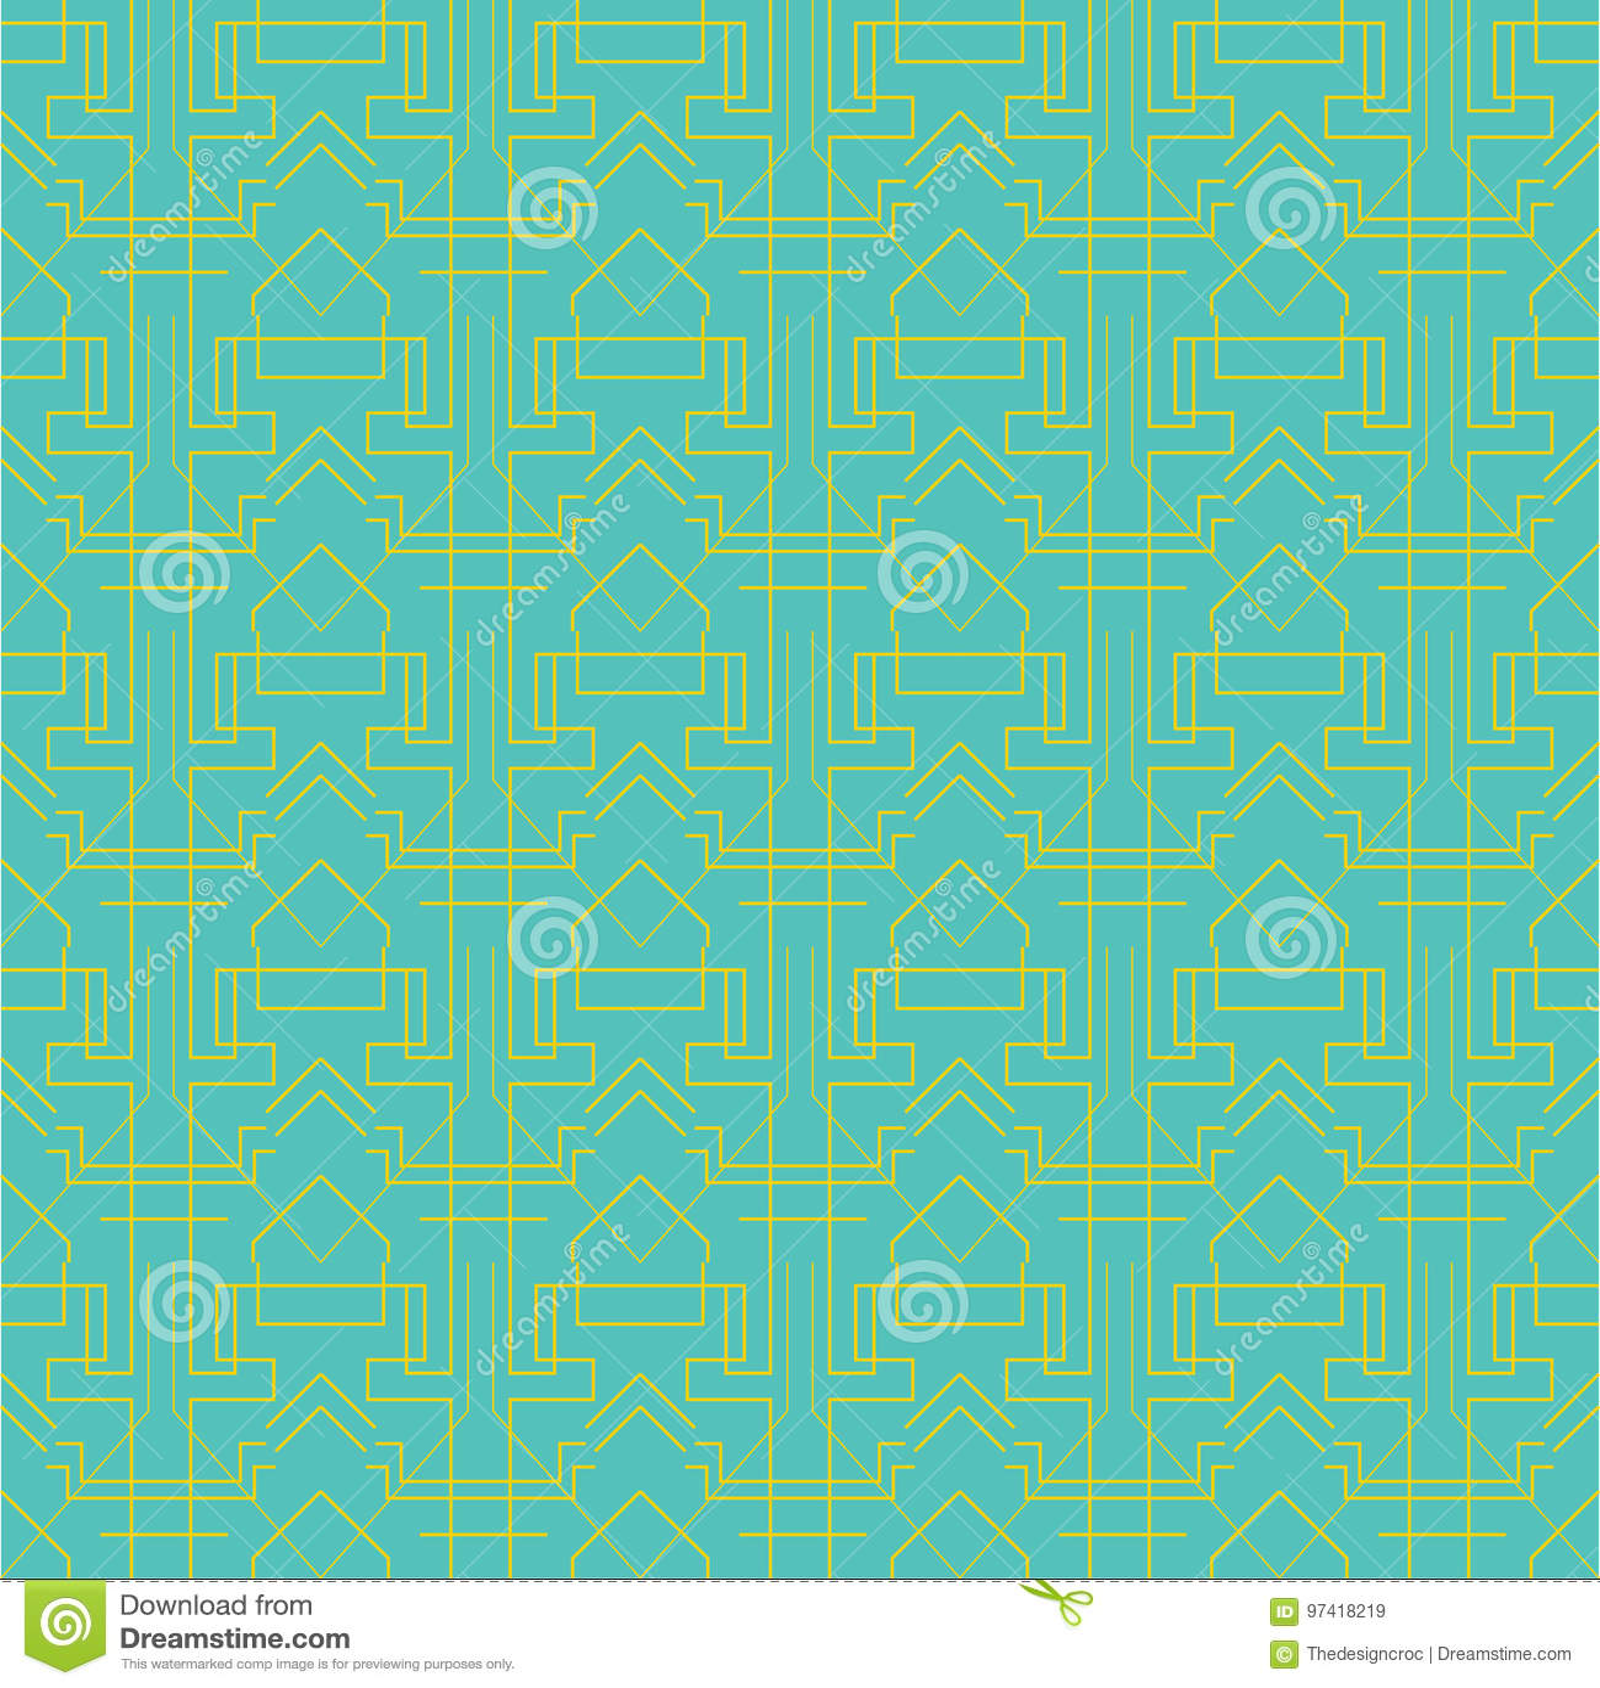 Art Deco Geometric Pattern Yellow Green Lines Blue